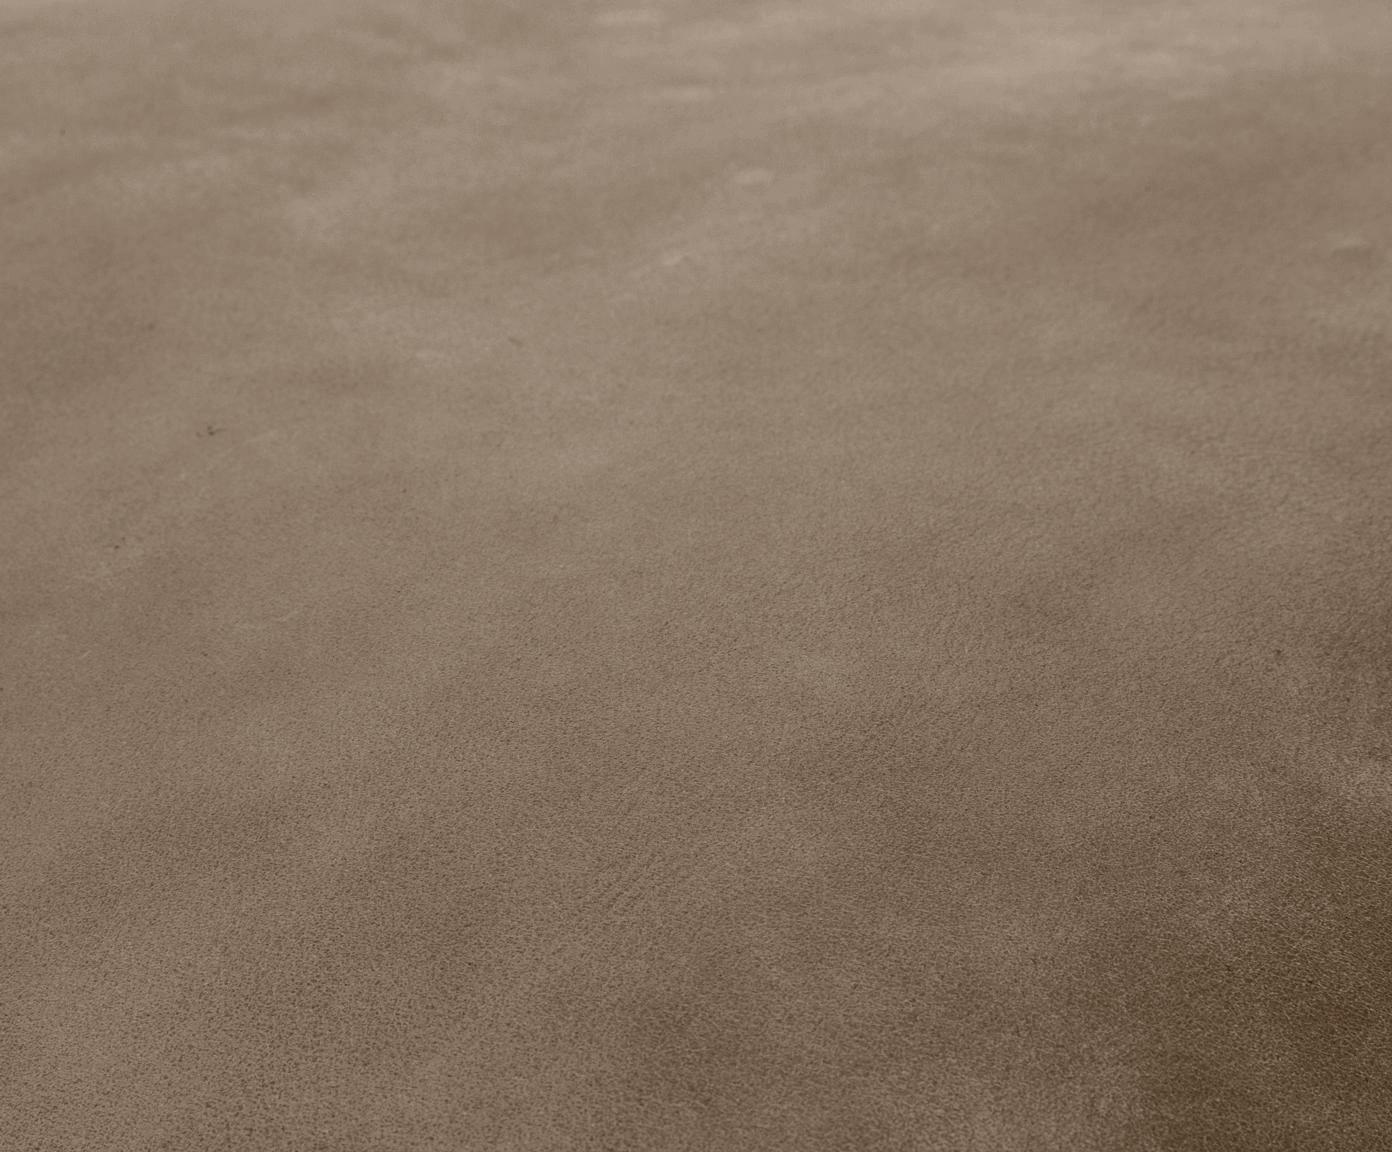 Lederpouf Porthos, Bezug: 100% Anilinleder, Braun, 80 x 33 cm